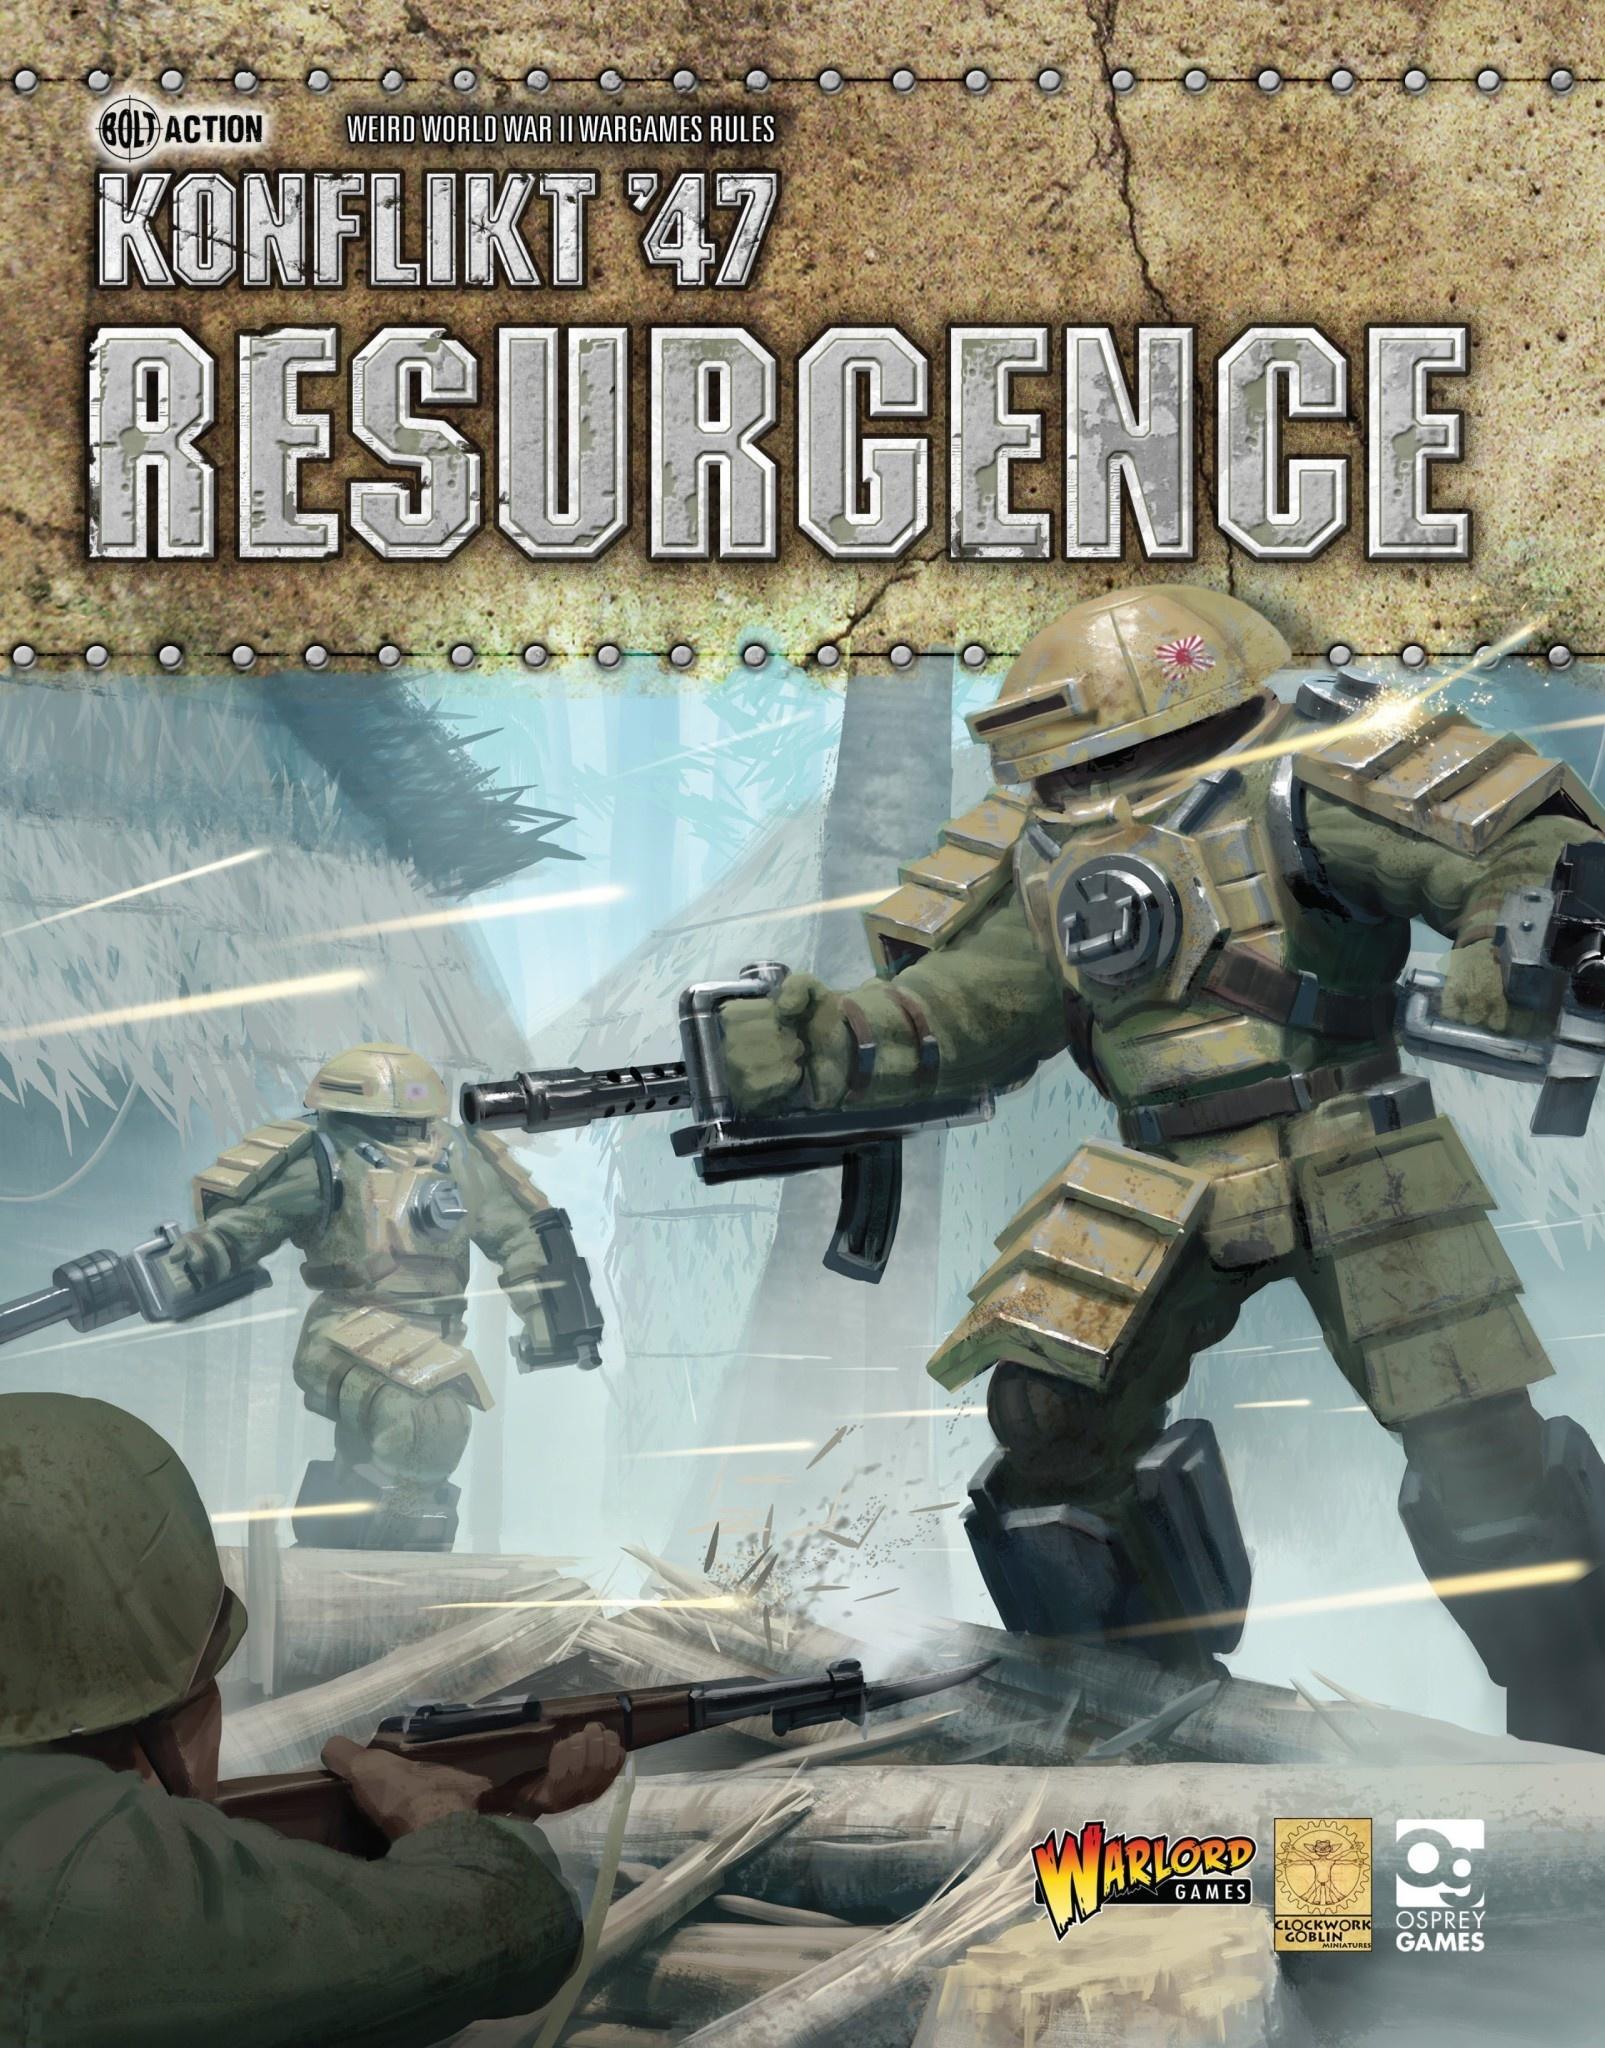 Warlord games Konflikt '47 Book: Resurgence